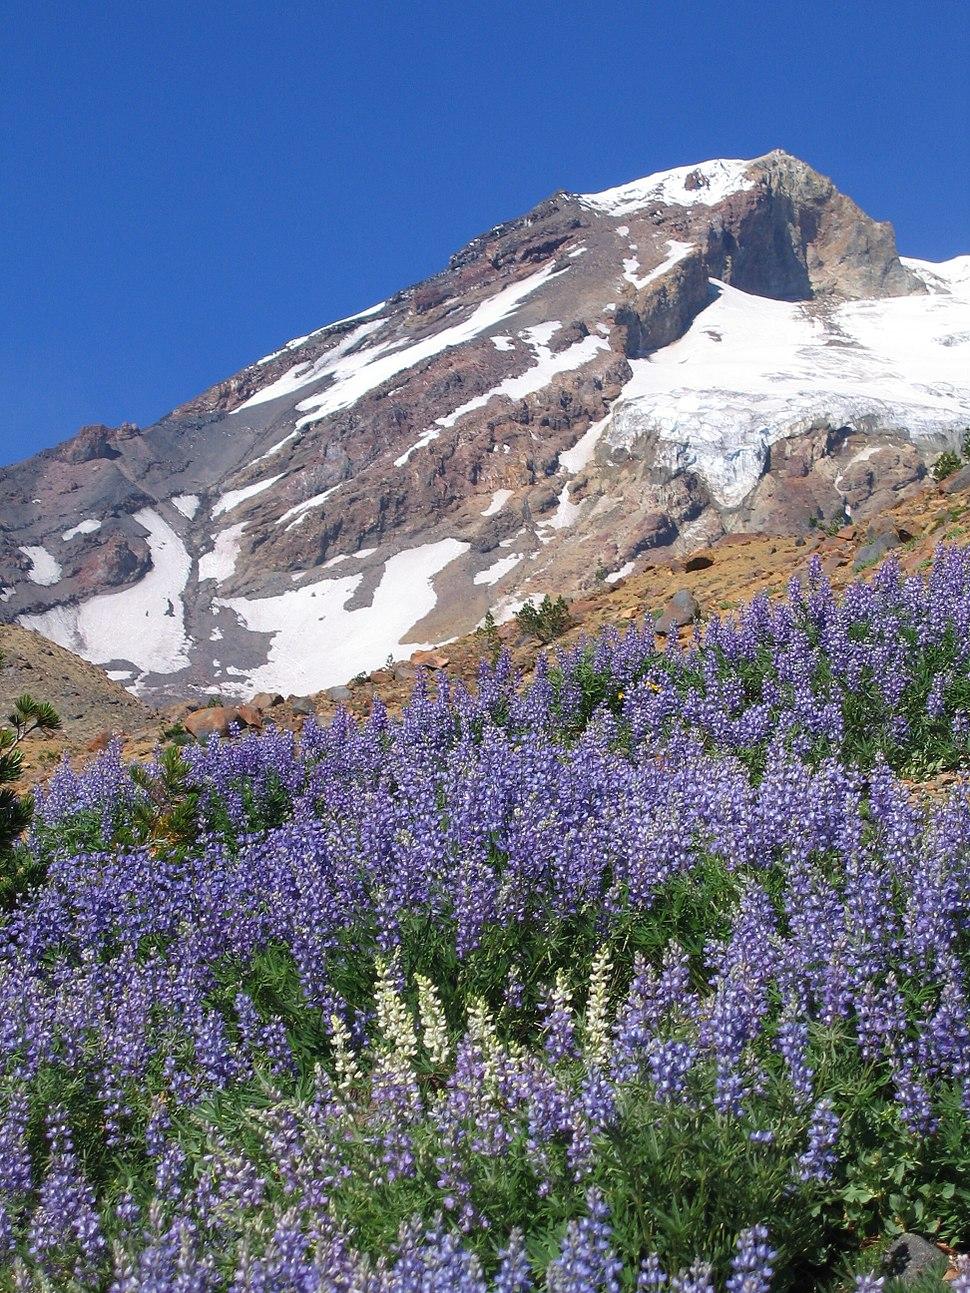 Lupine on Mount Adams (Washington)